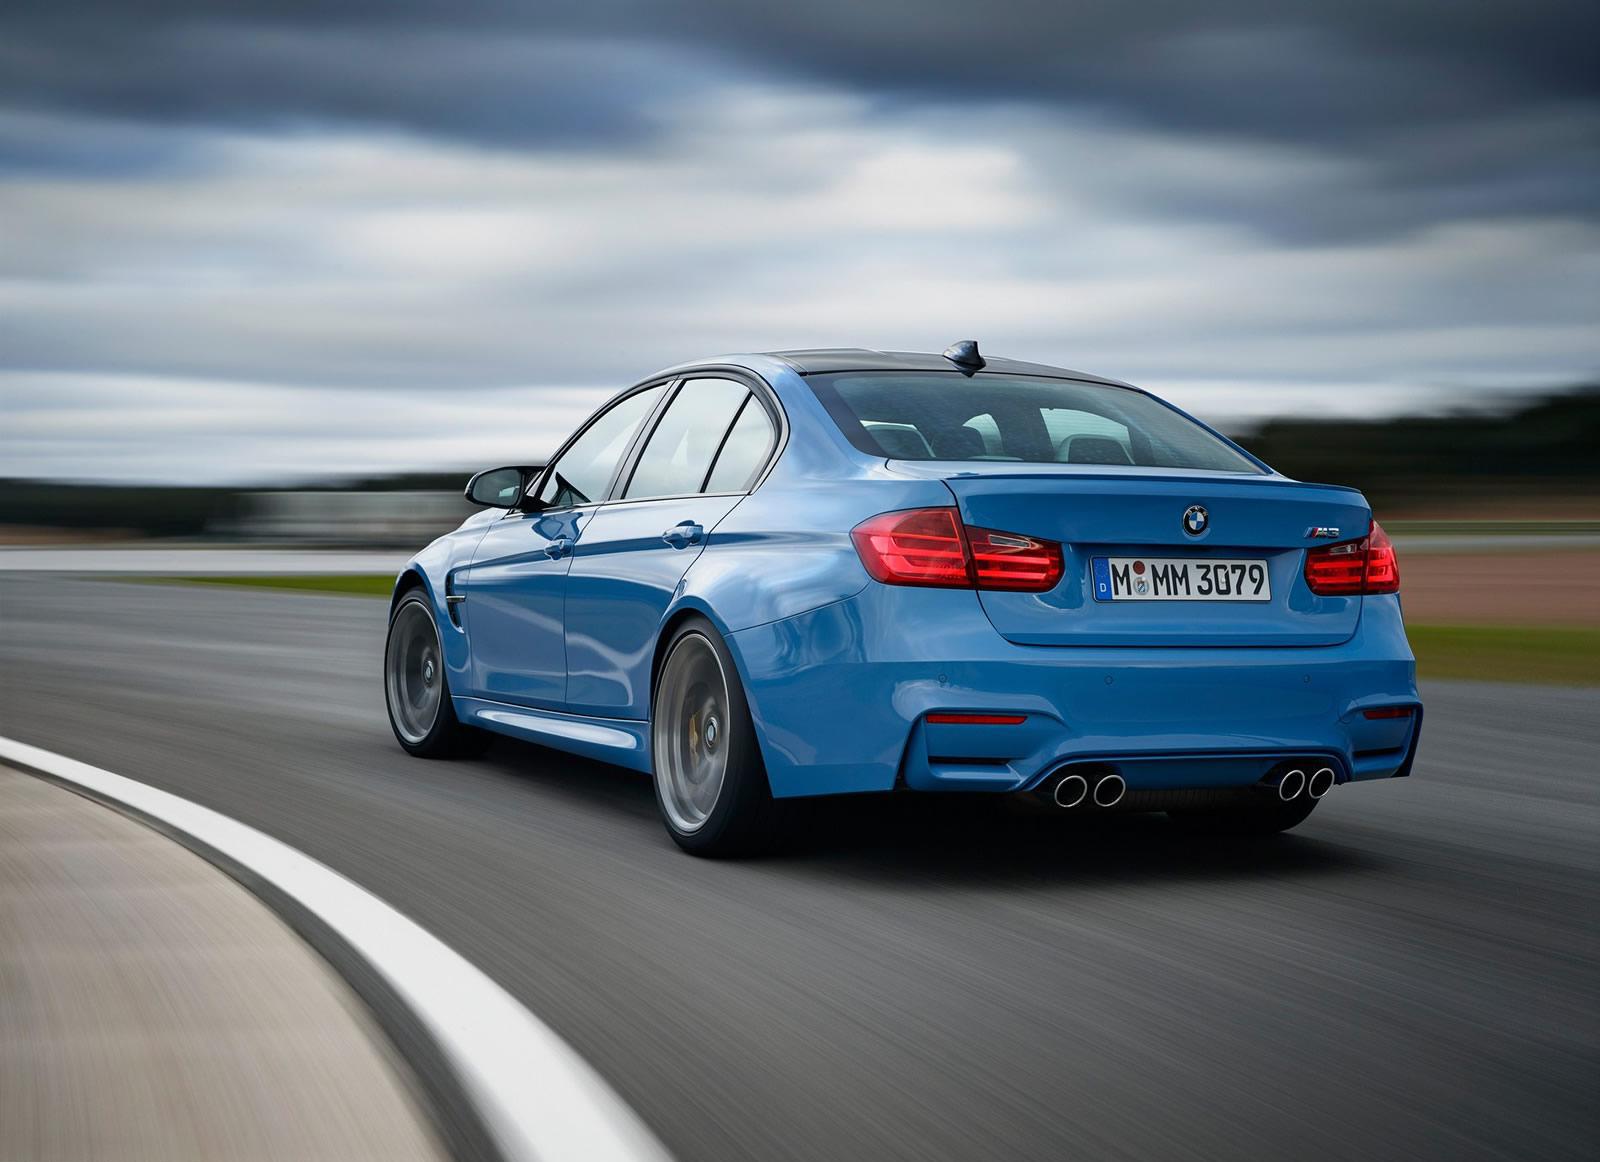 Foto de BMW M3 2014 (12/13)